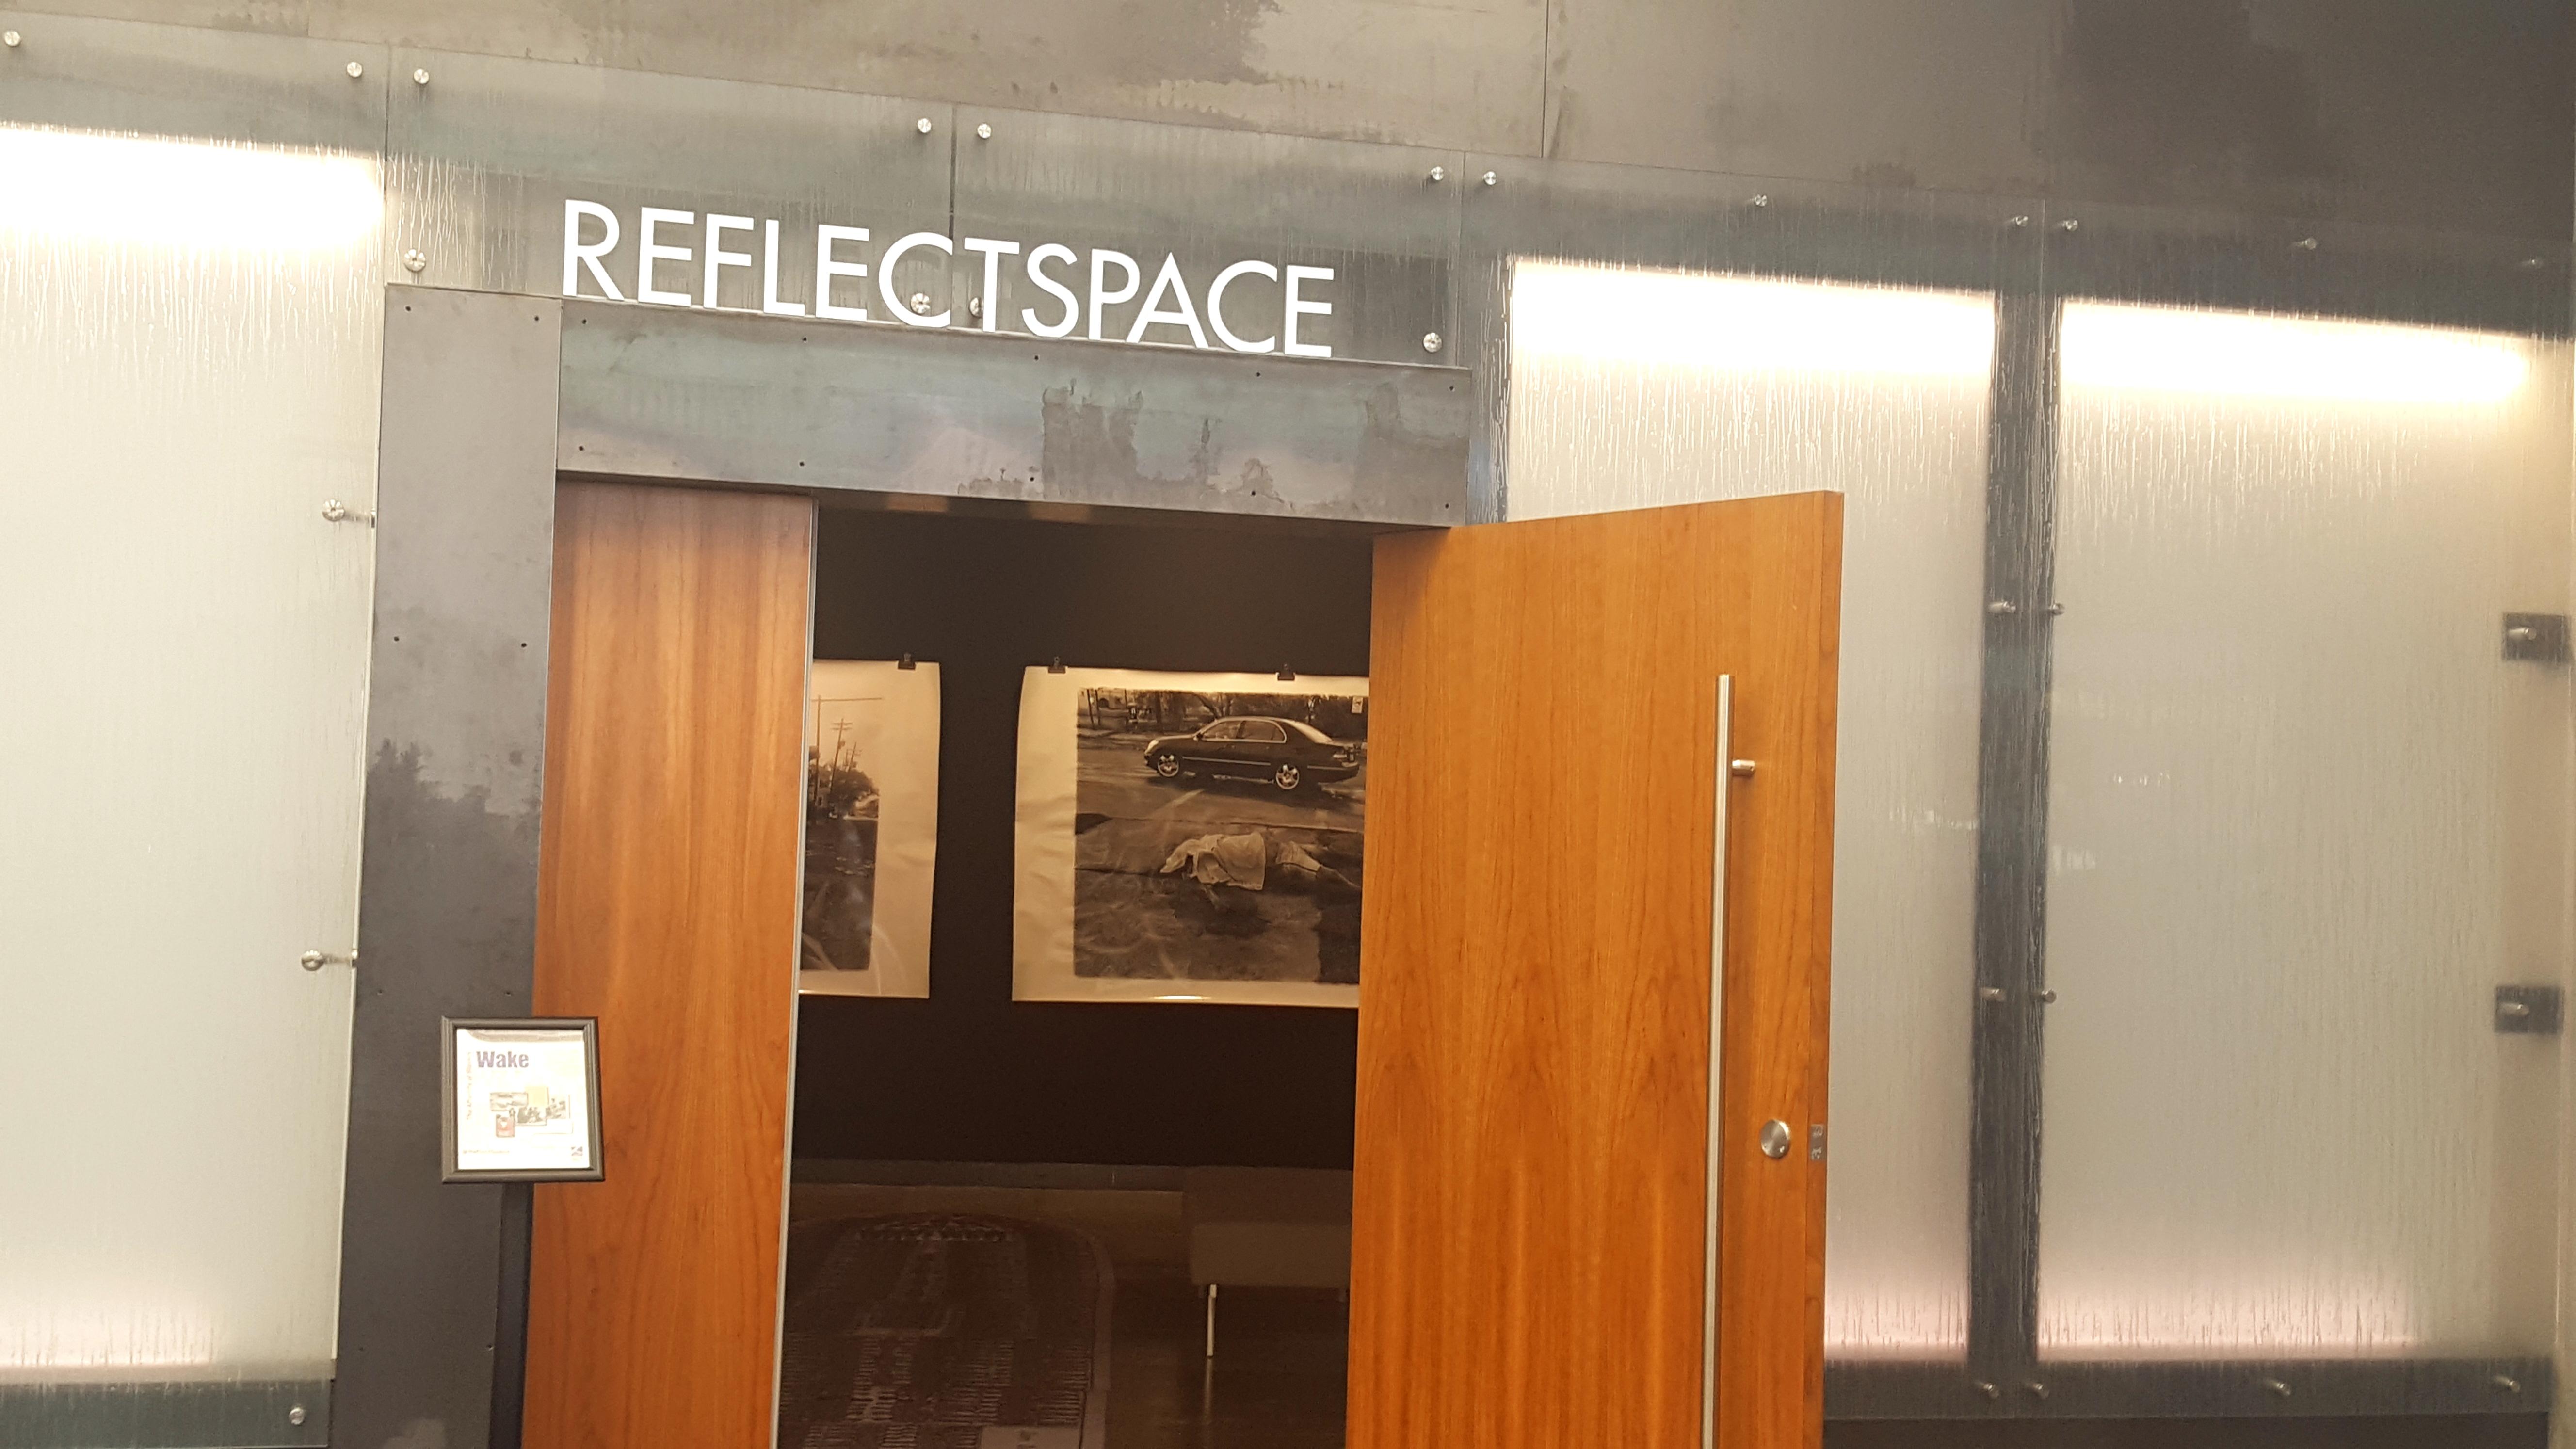 ReflectSpace Glendale Public Library